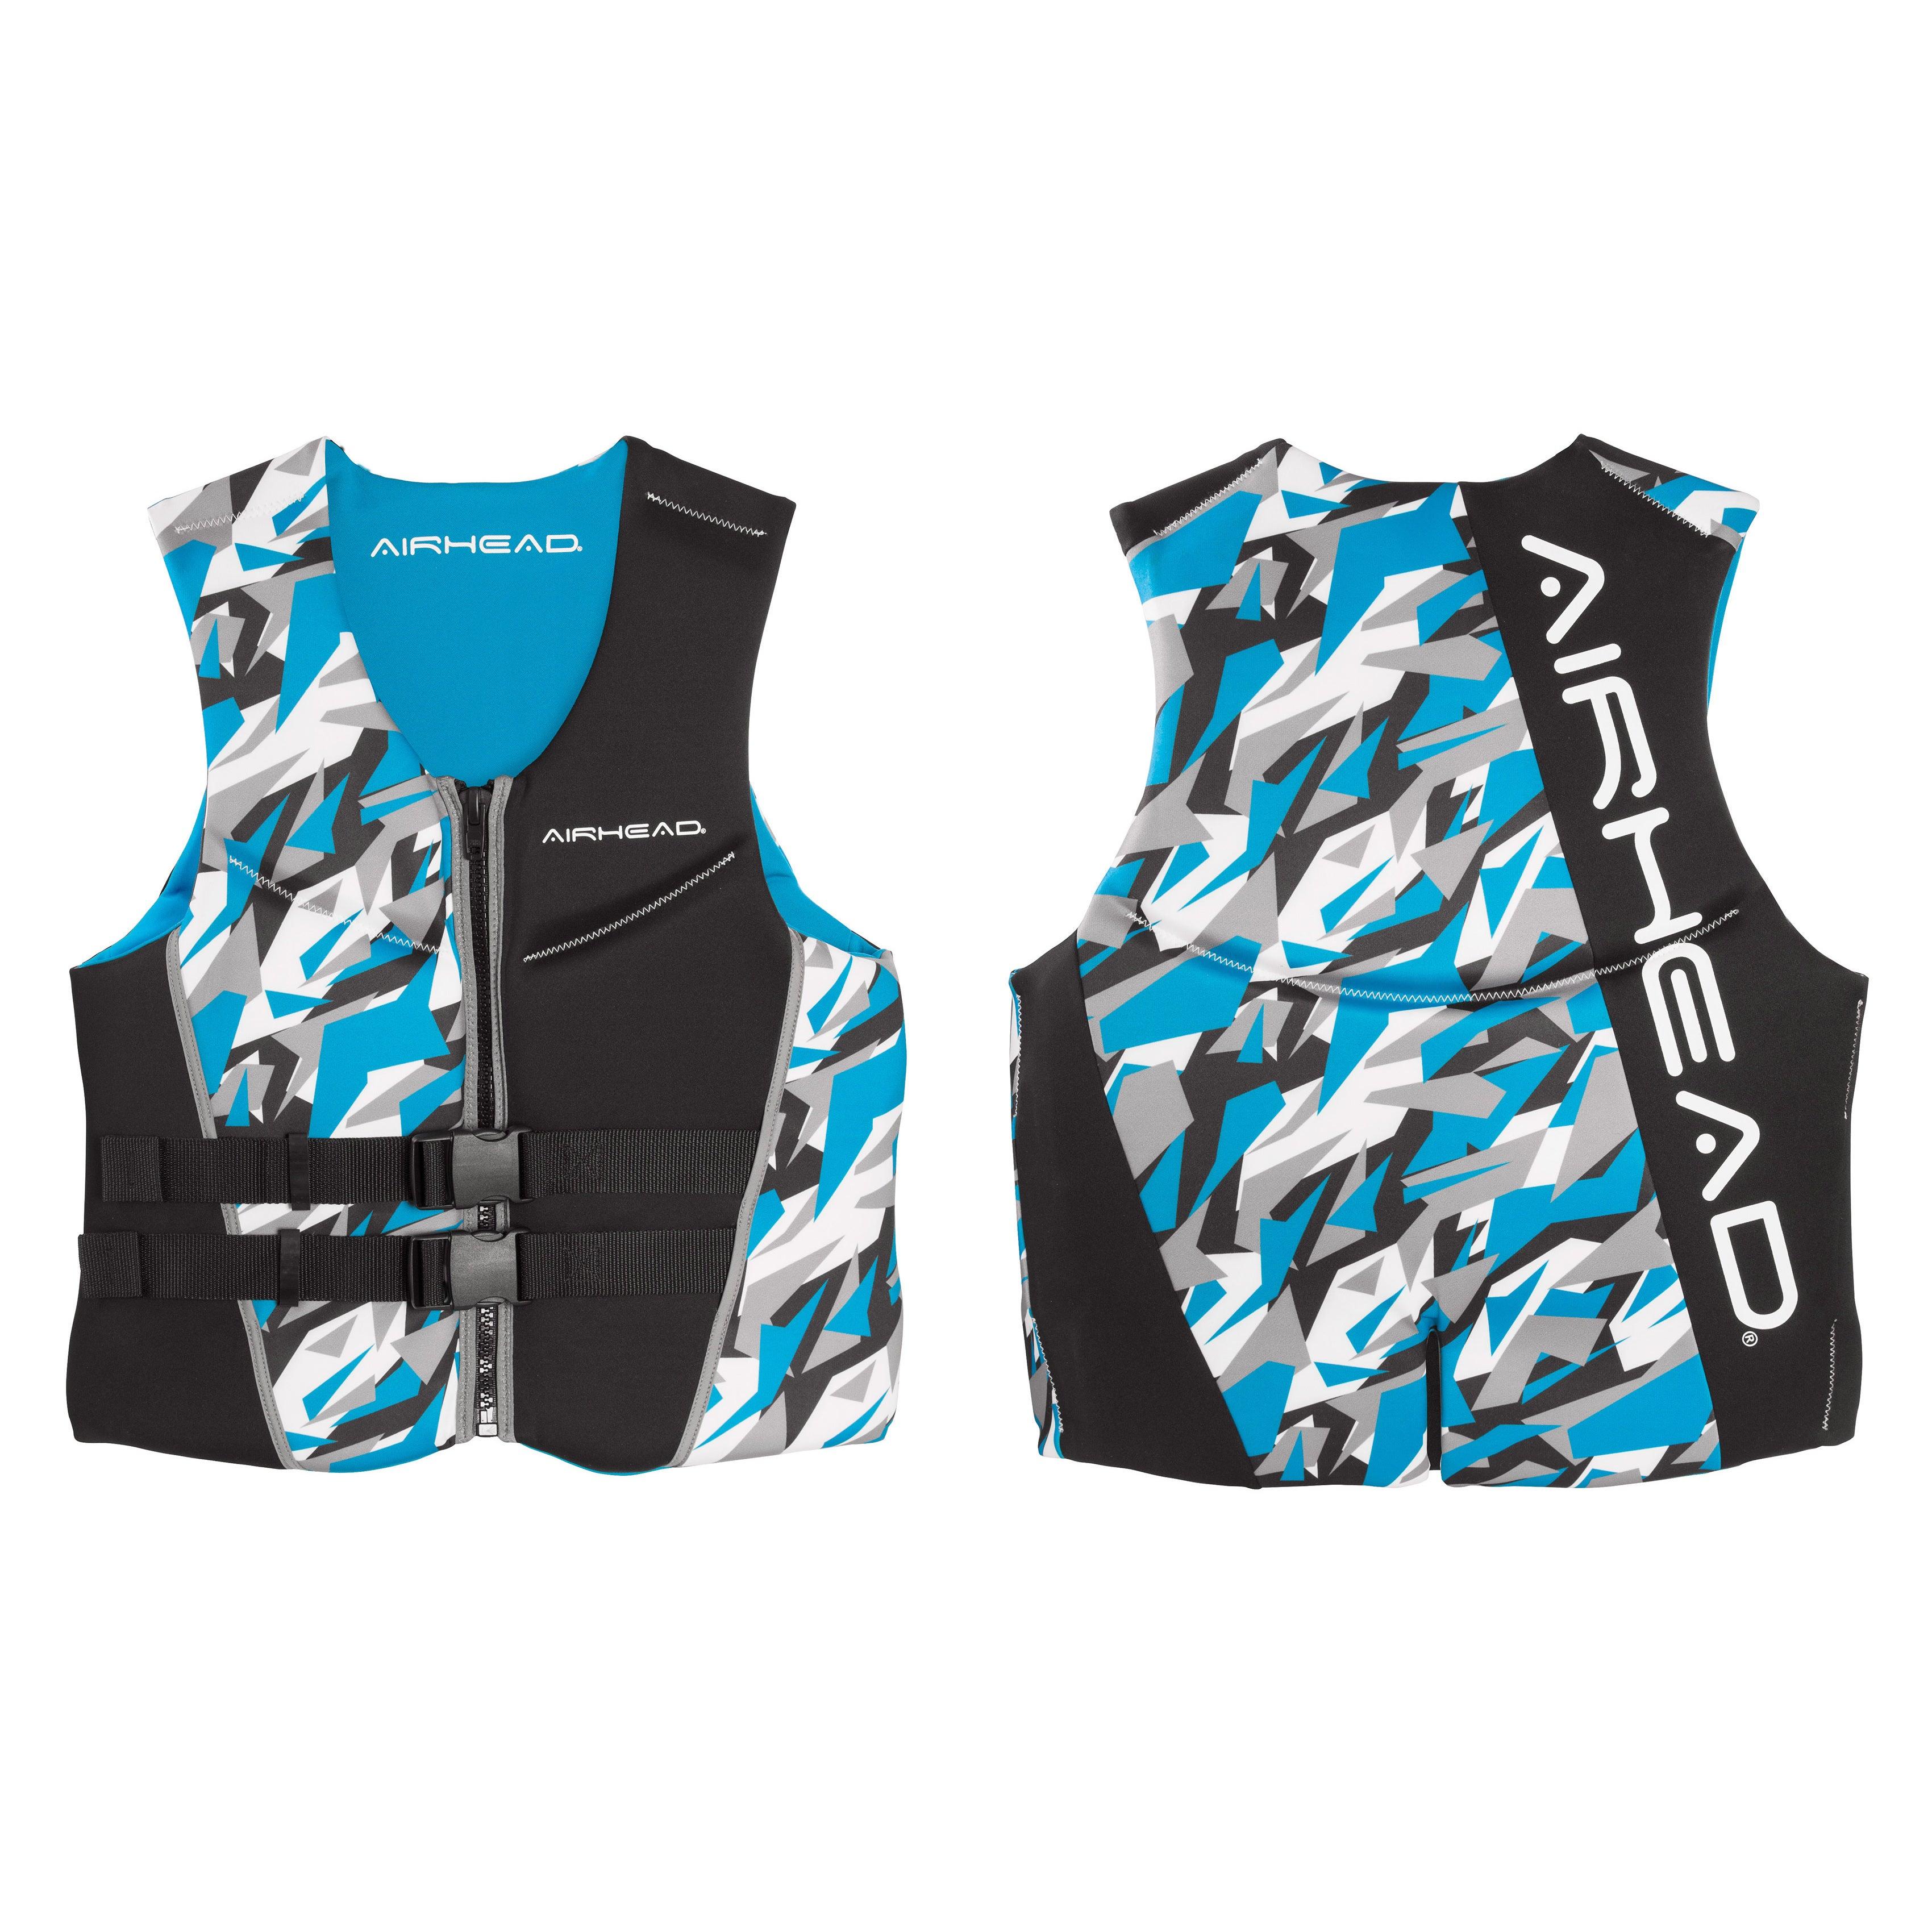 Airhead Men's 'Camo Cool' Blue Neoprene Kwik-dry Neolite Vest (CAMO COOL Men's Kwik-Dry Neolite Vest, Blue, 2XL) thumbnail